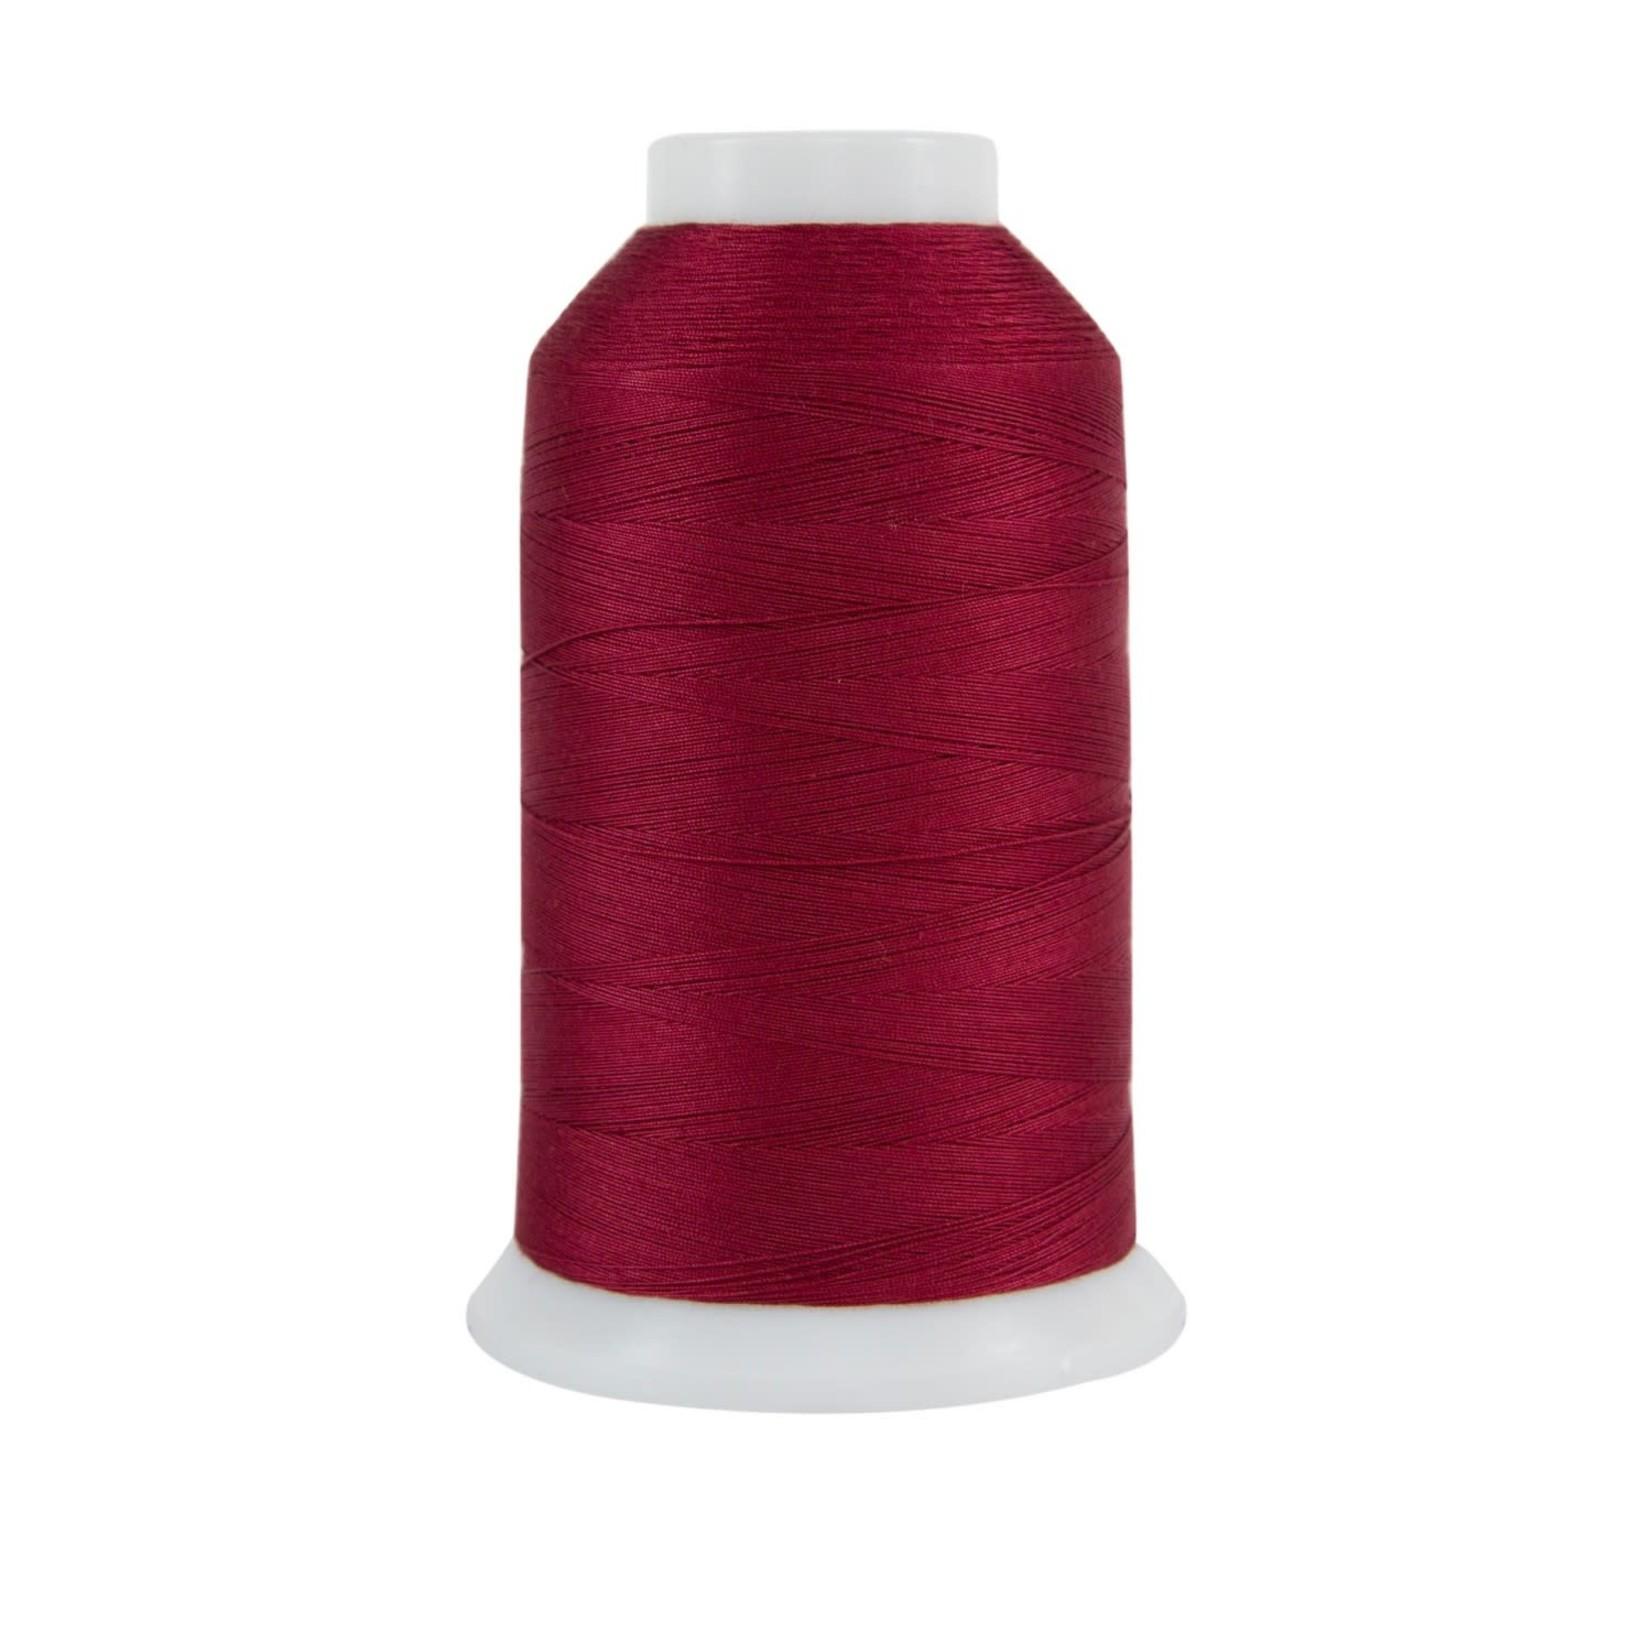 Superior Threads King Tut - #40 - 1828 m - 1000 Romy Red